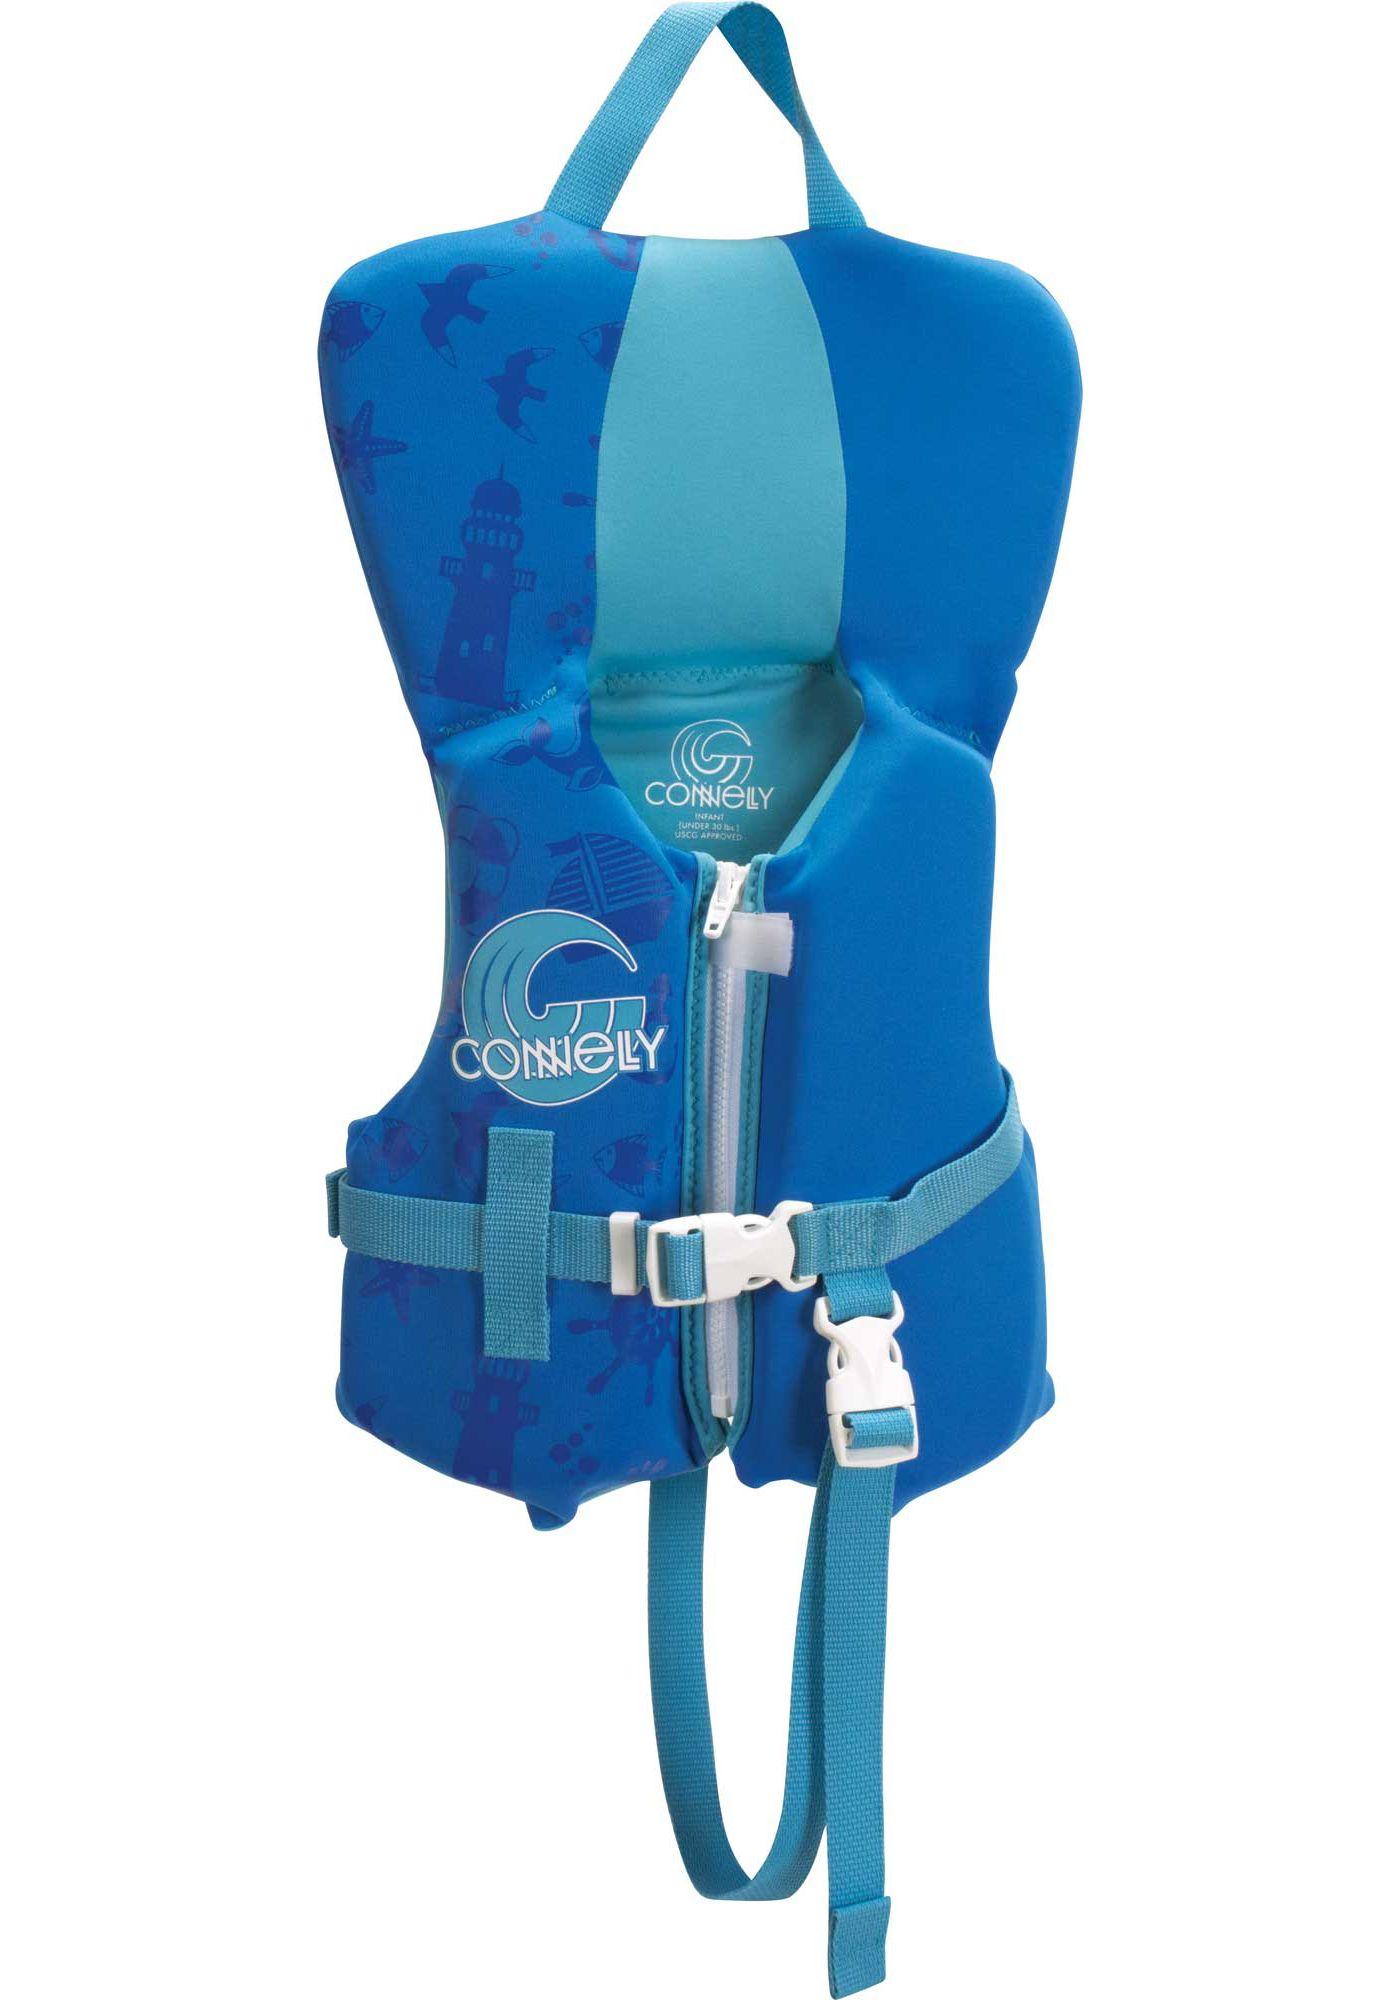 Connelly Infant Promo Neoprene Life Vest